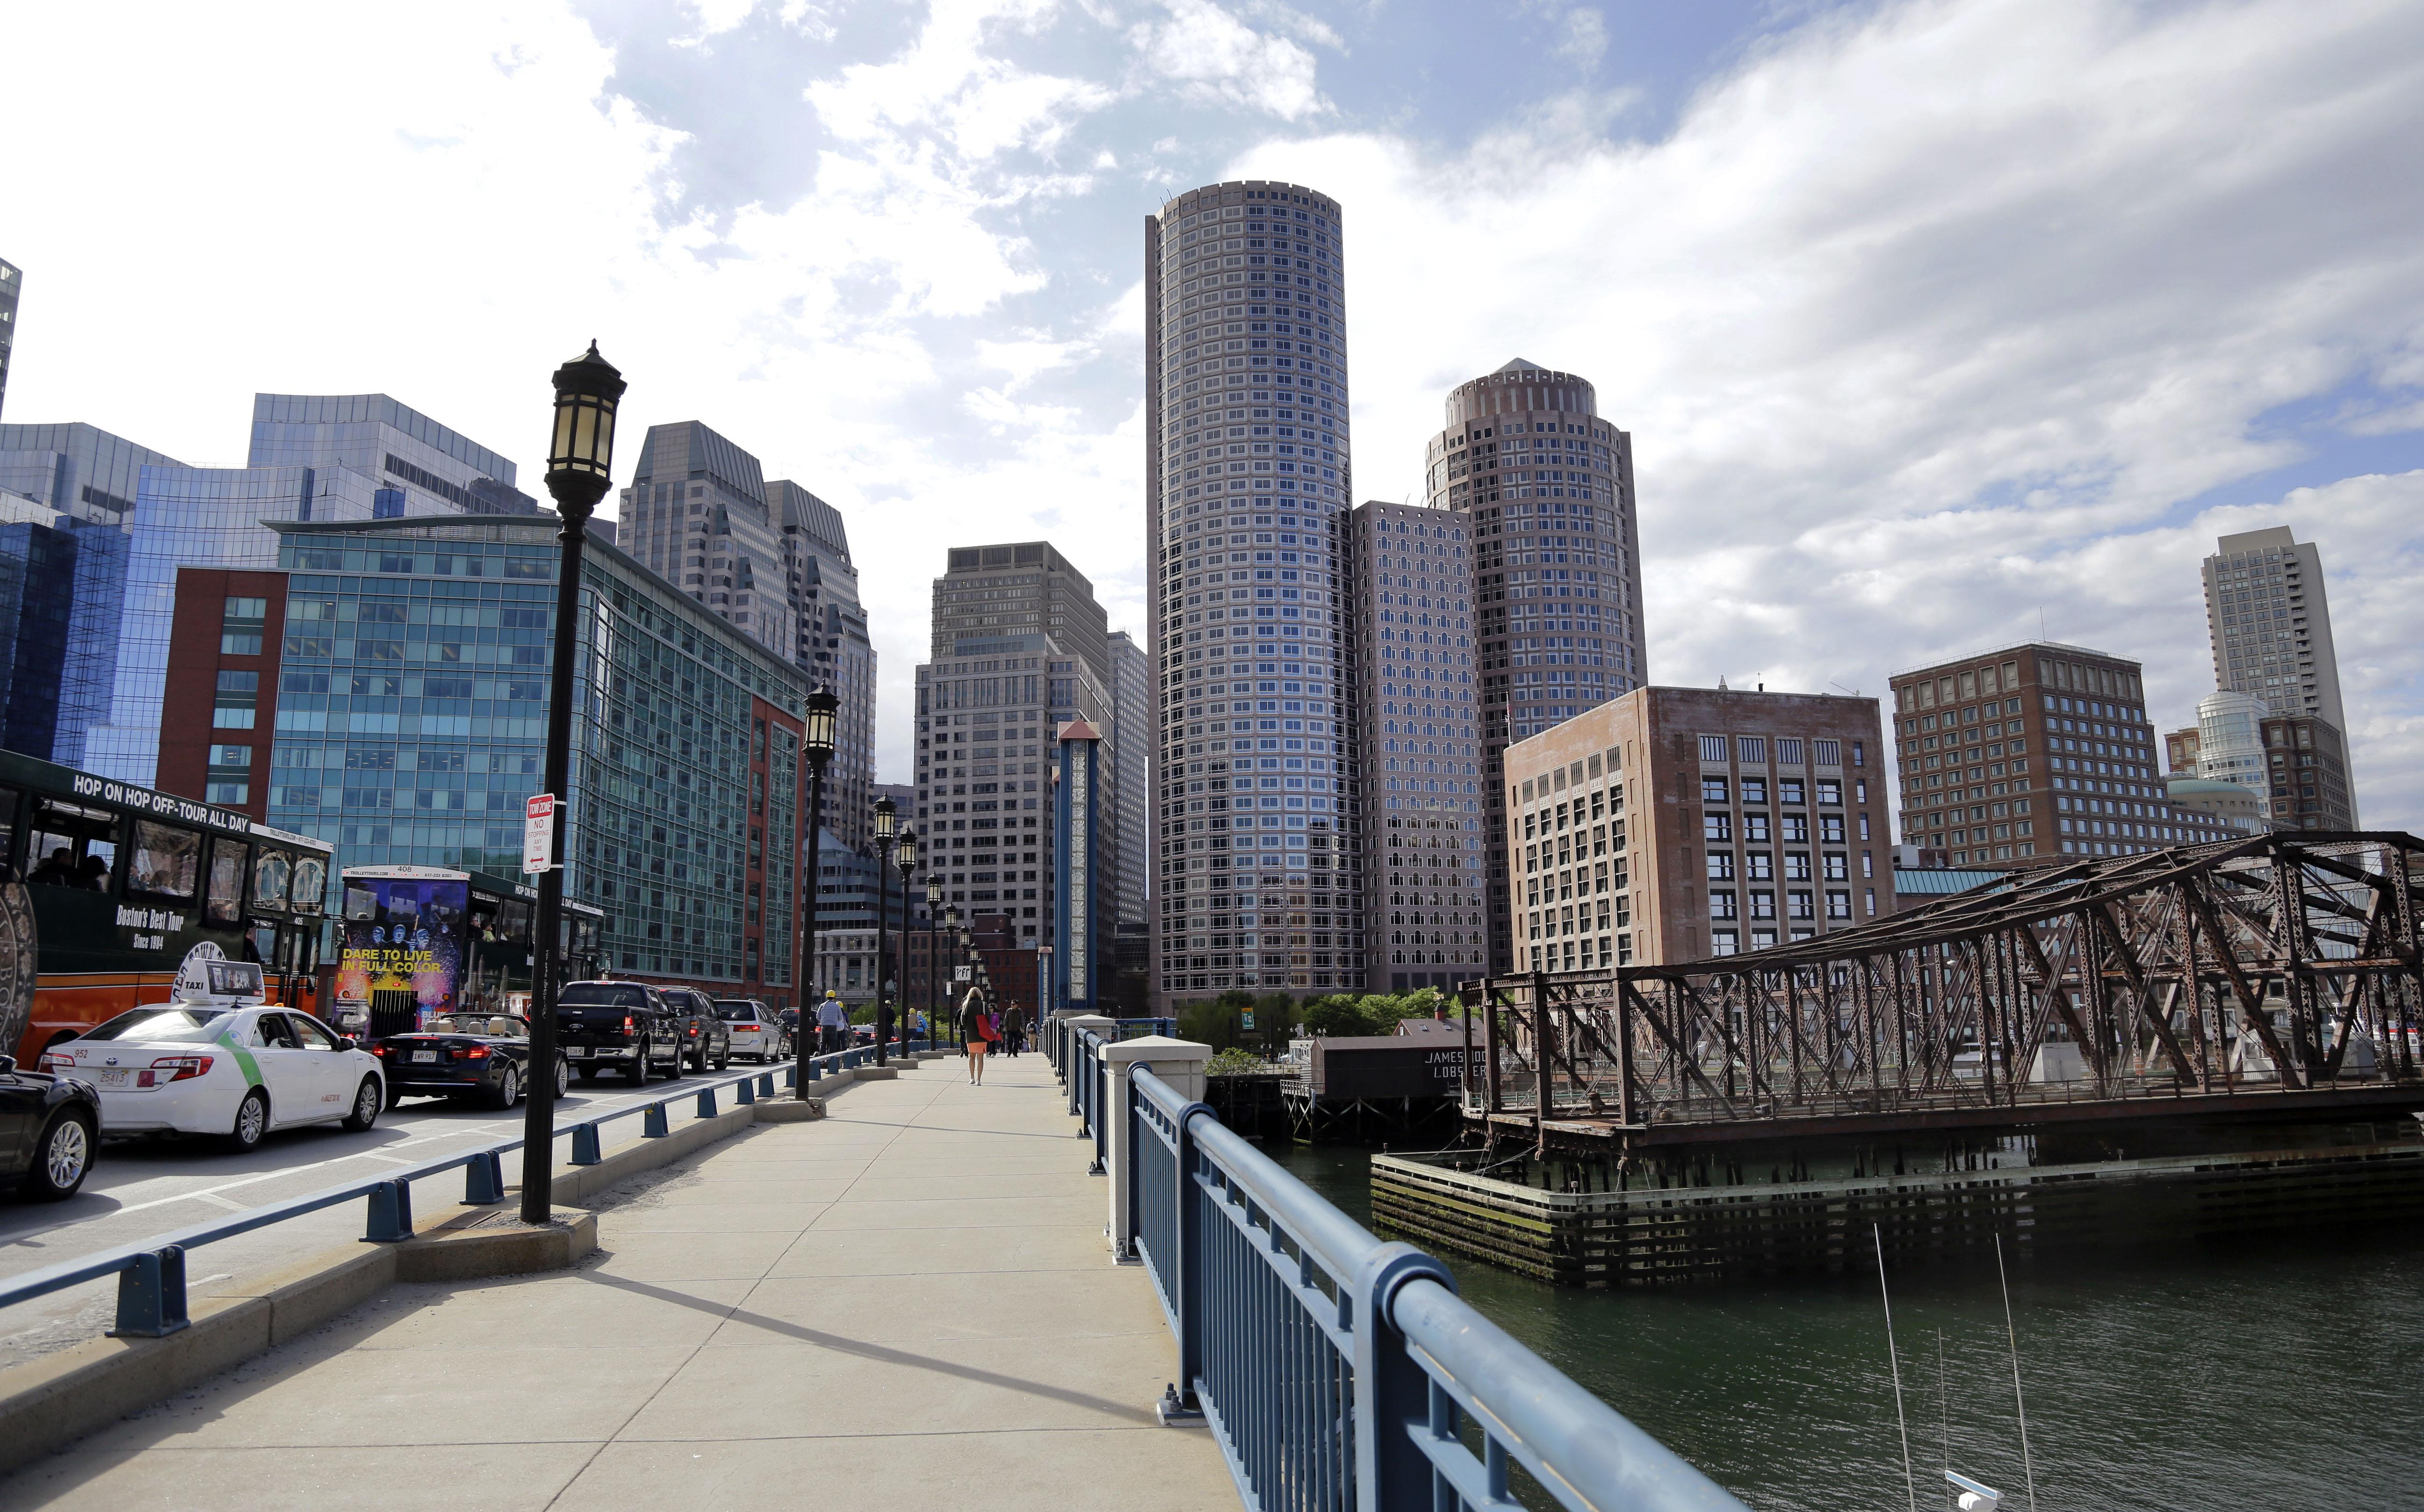 A view of downtown Boston from the Evelyn Moakley Bridge, in BostonBoston Skyline, Boston, USA